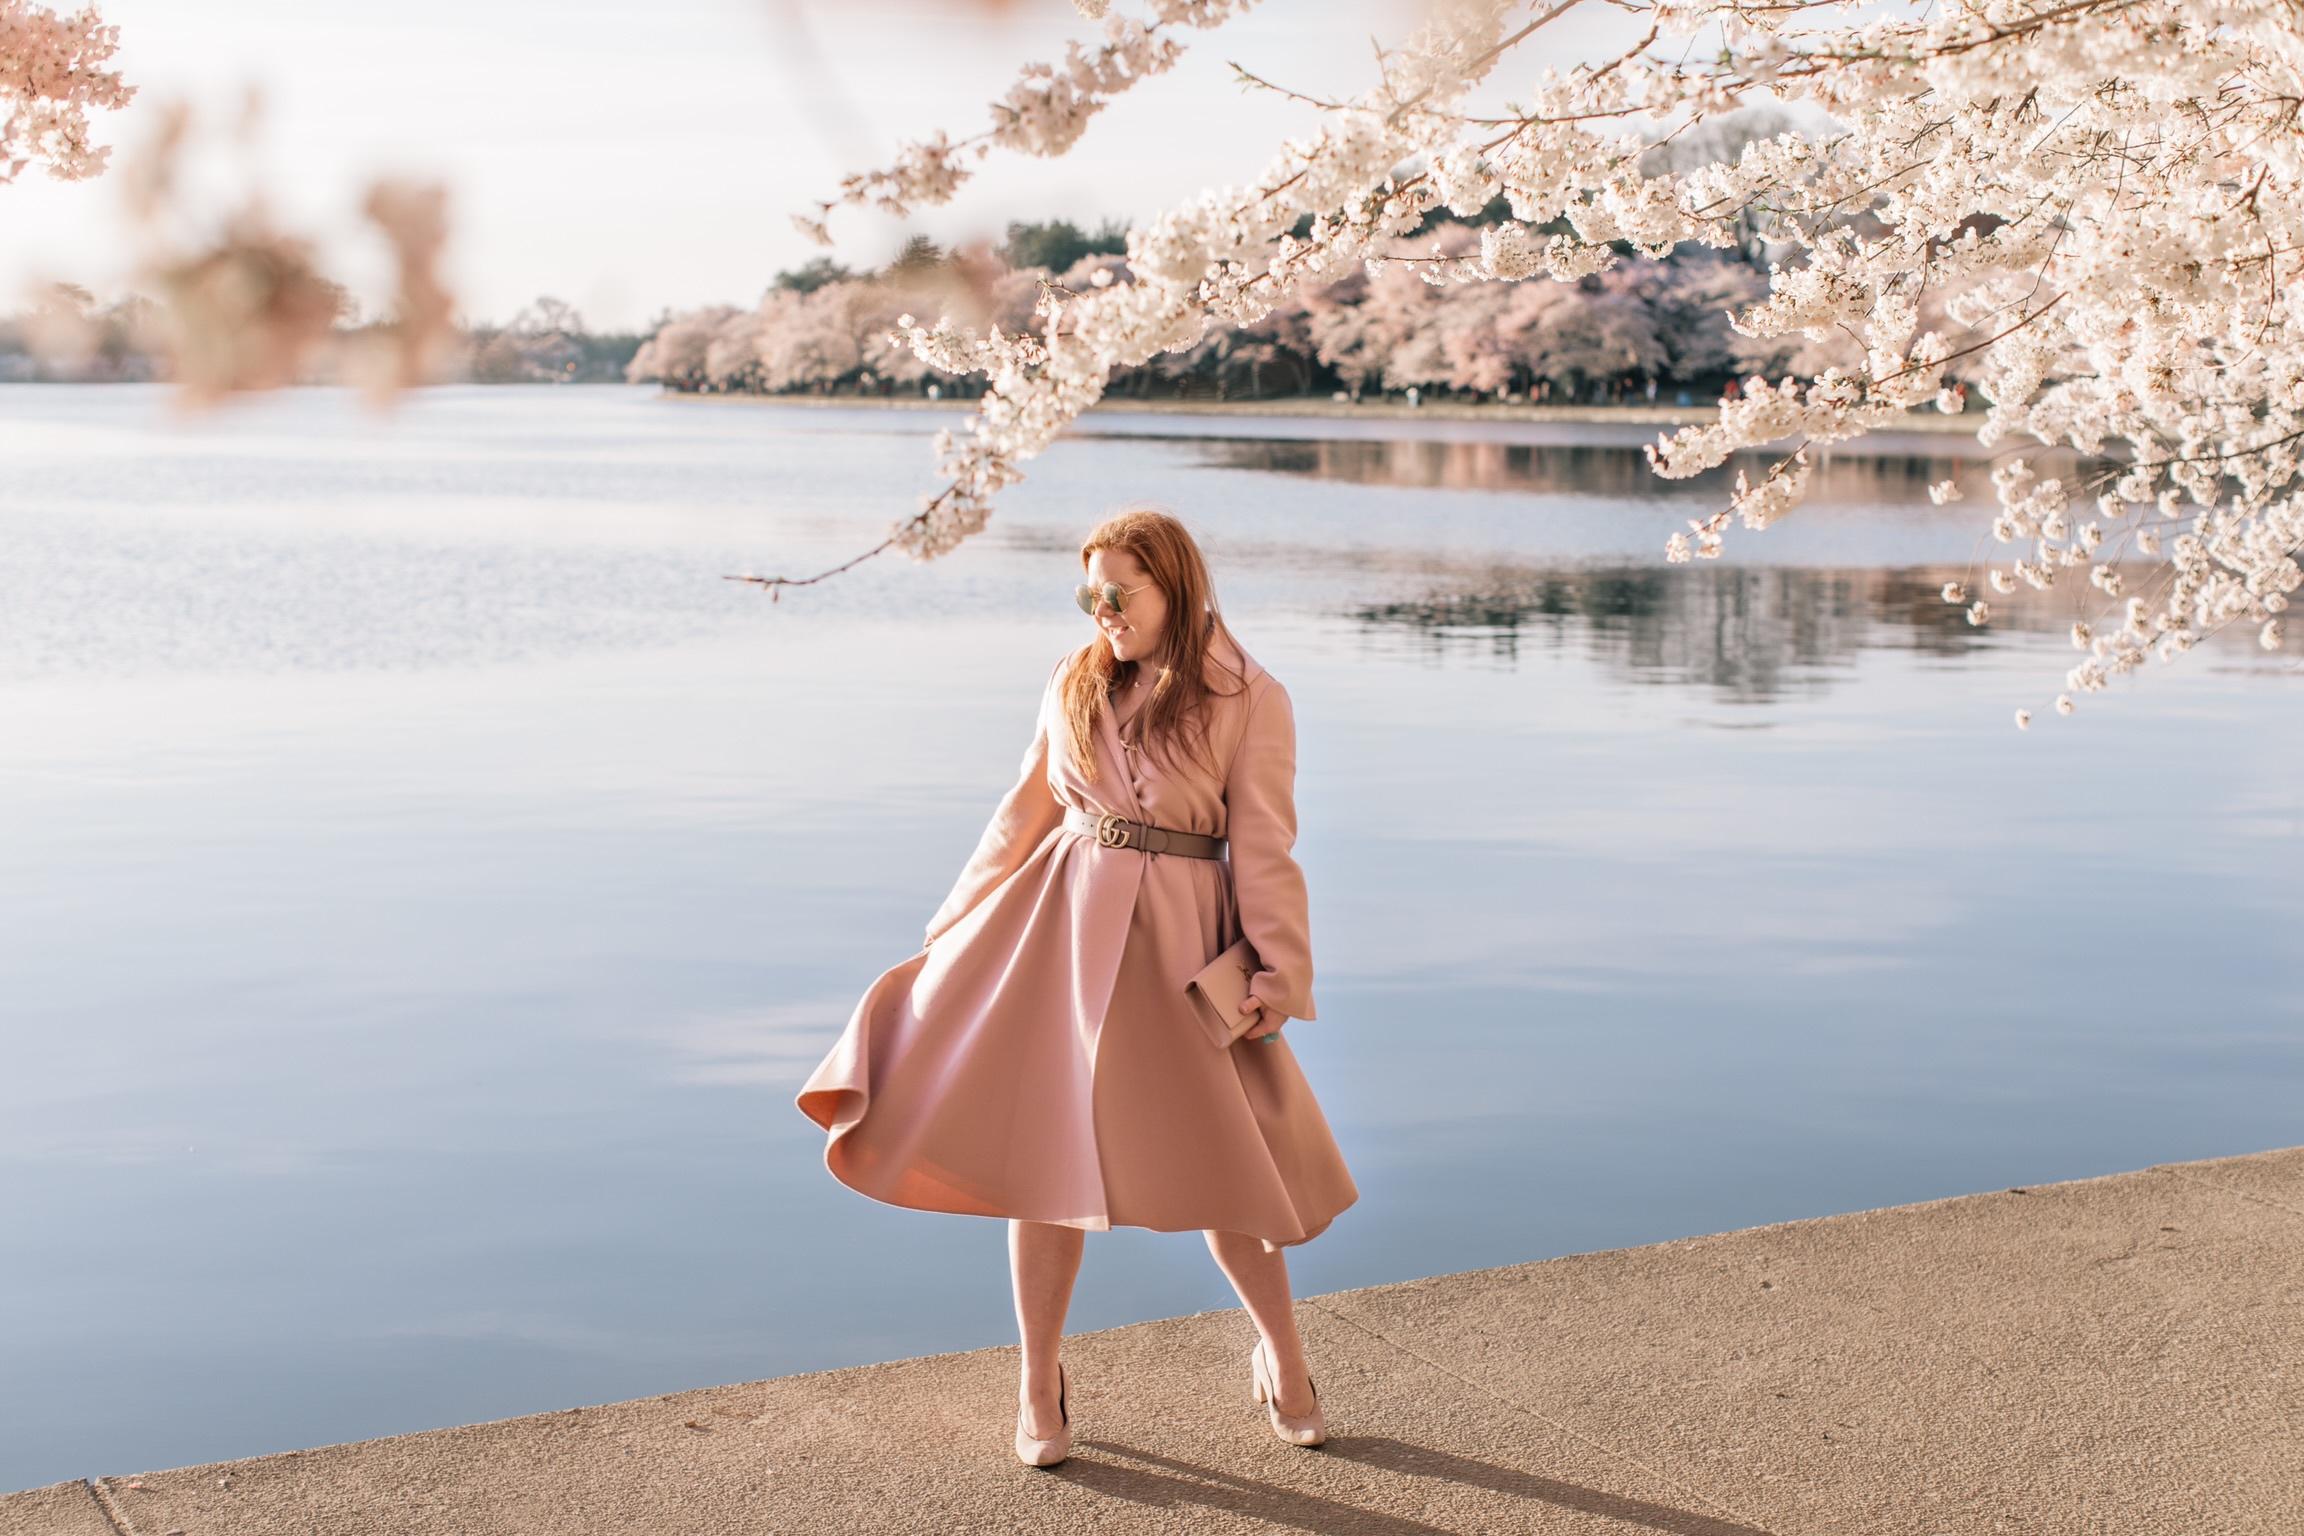 dc_cherry_blossoms-1.JPG